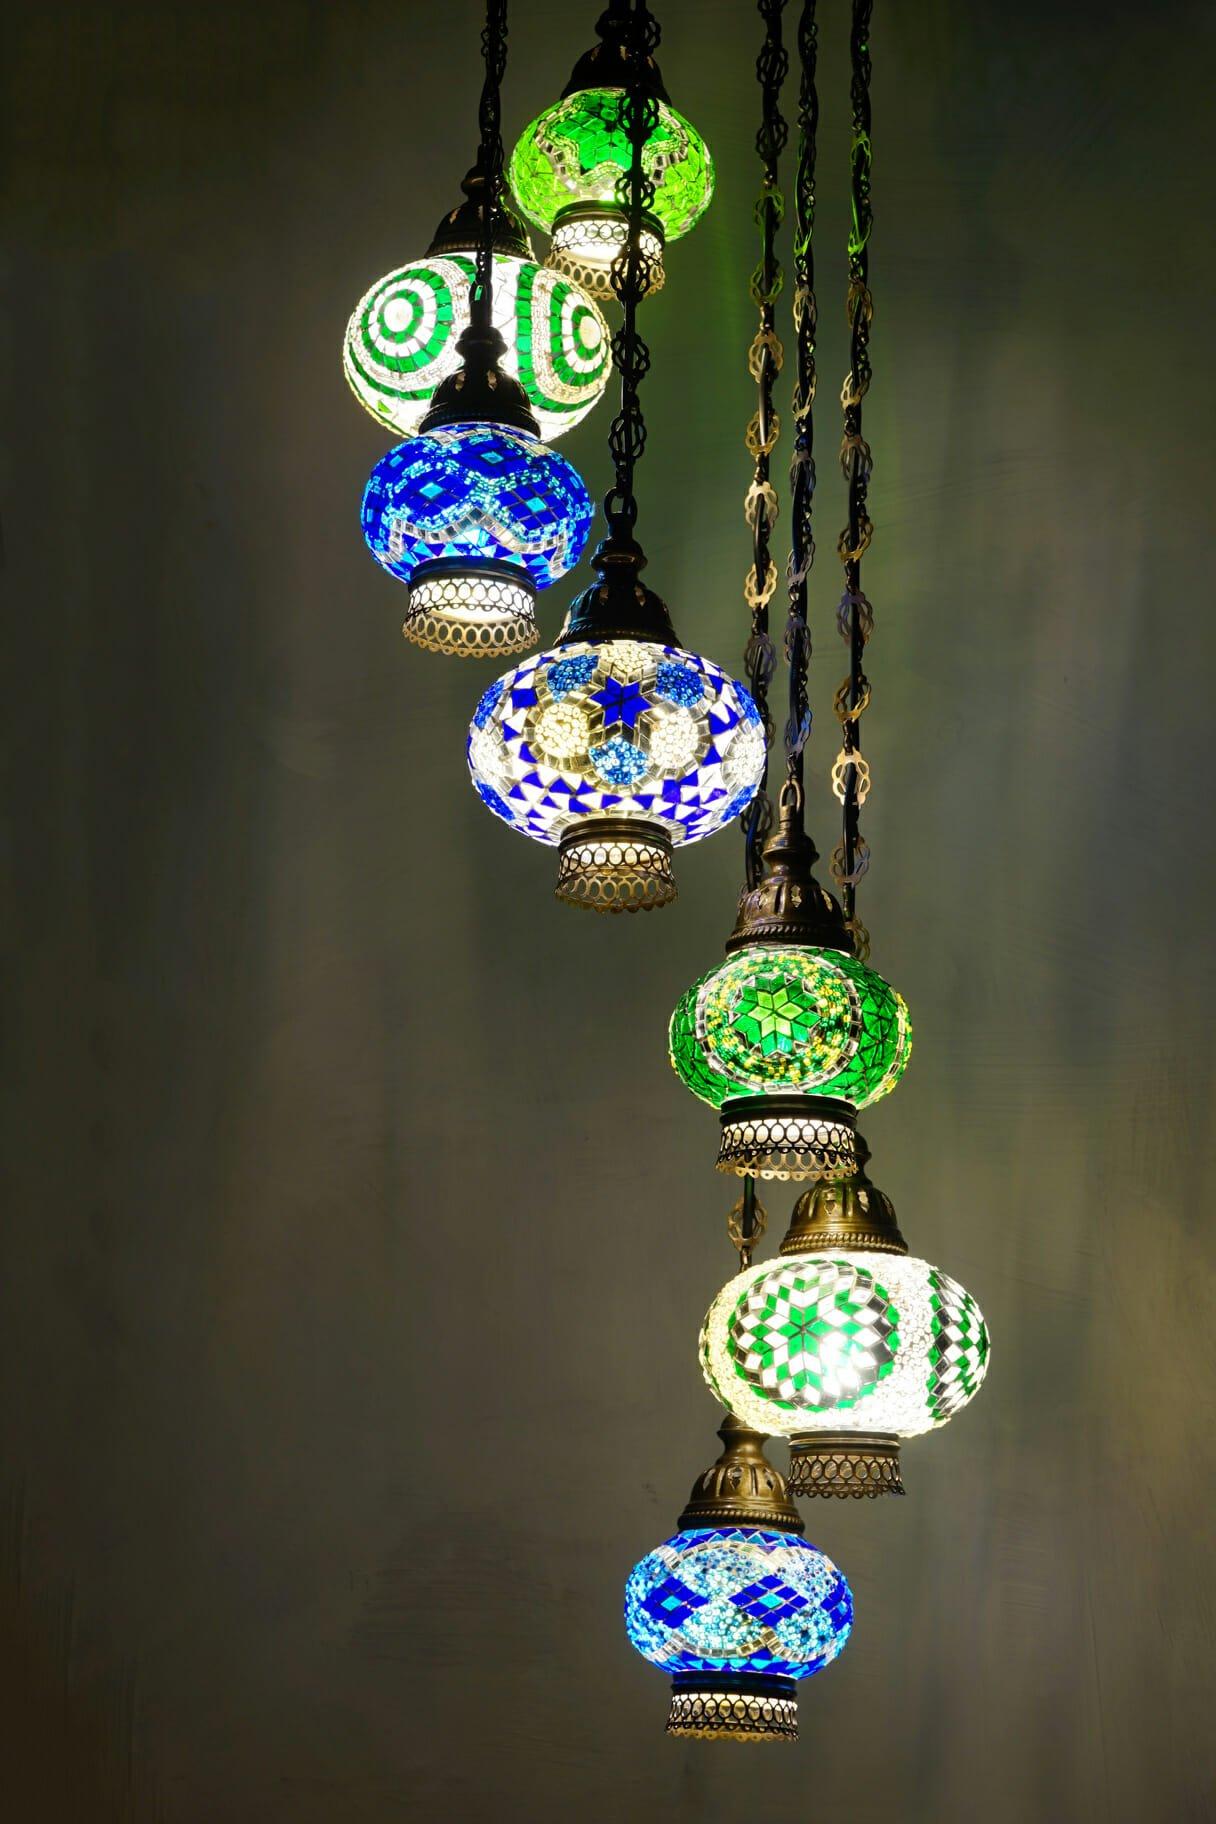 Spiral 7 piece mosaic chandelier the dancing pixie 7 piece green and blue spiral chandelier distance aloadofball Images